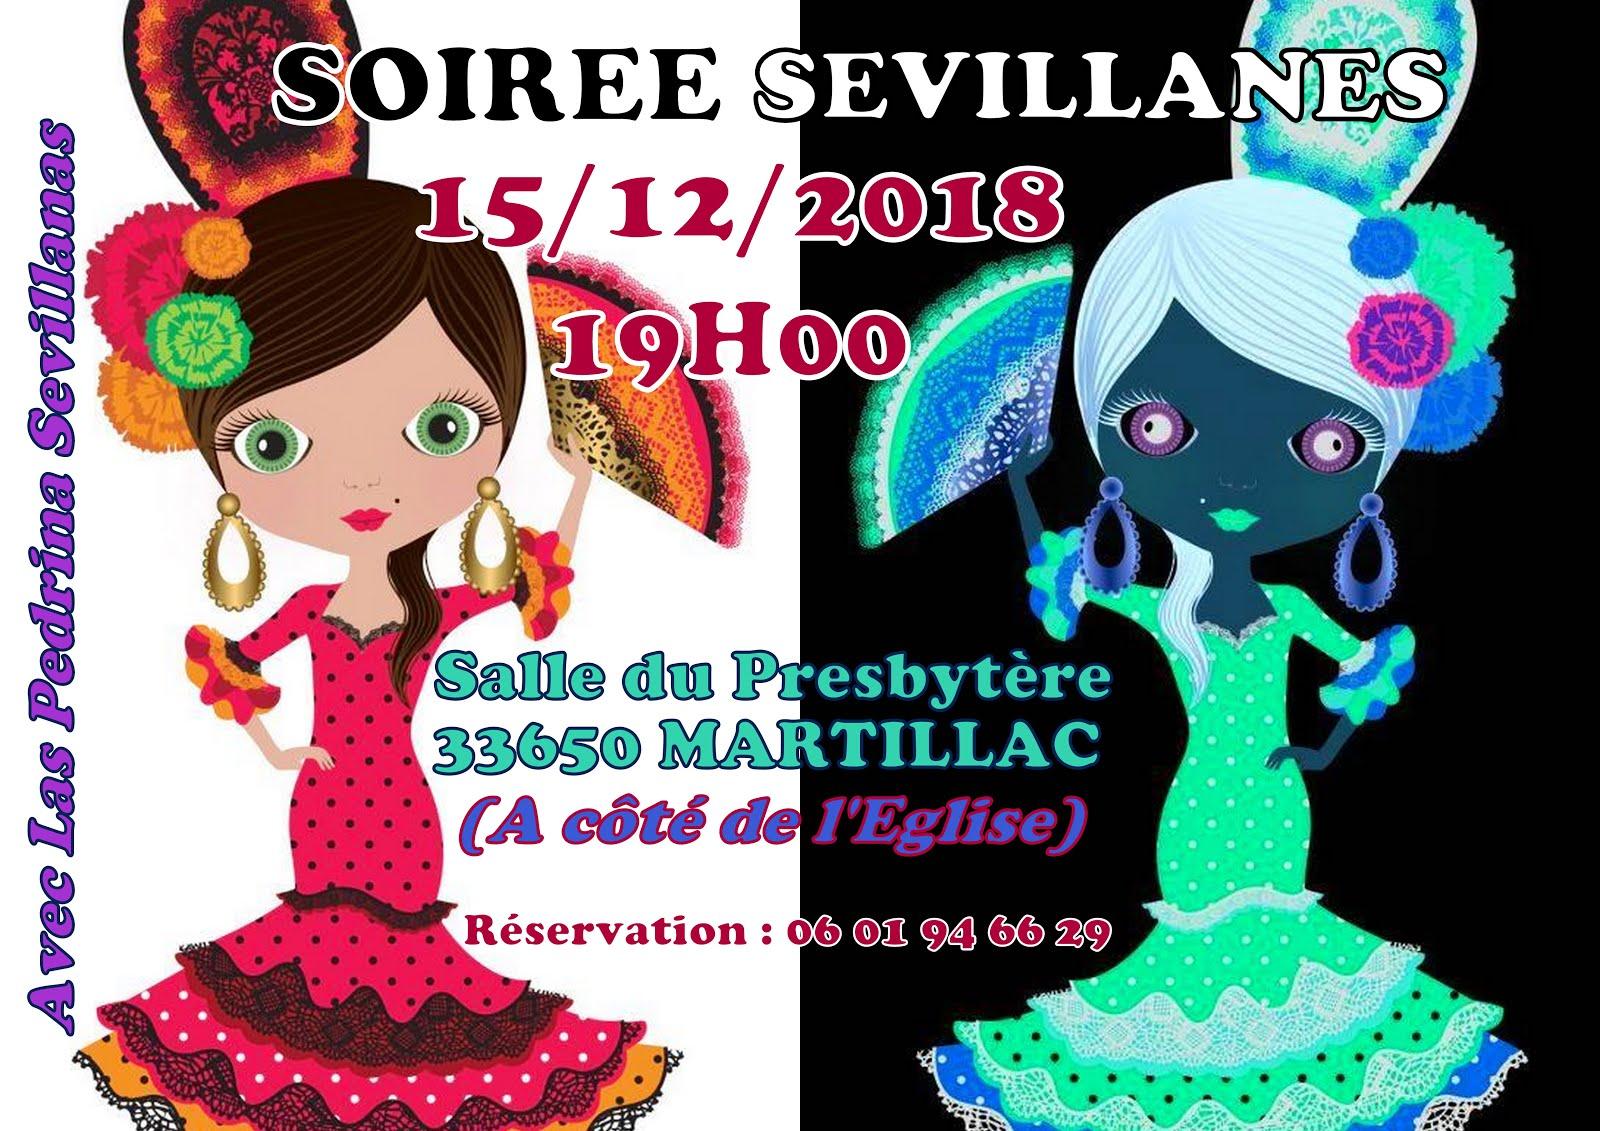 SOIREE SEVILLANES 15 DECEMBRE 2018